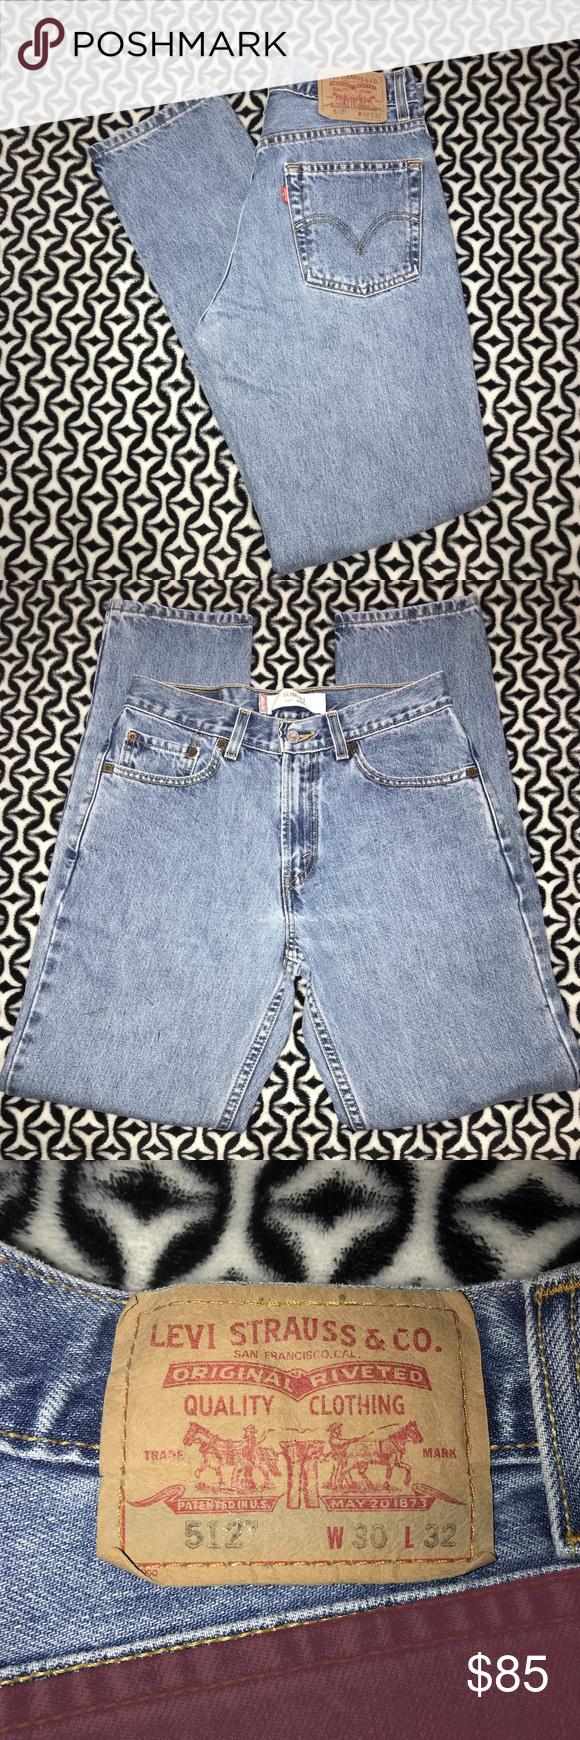 03c4a17264 Vintage Levi's 512 Vintage Levi's 512 slim fit high waisted mom jeans.  Stone wash.